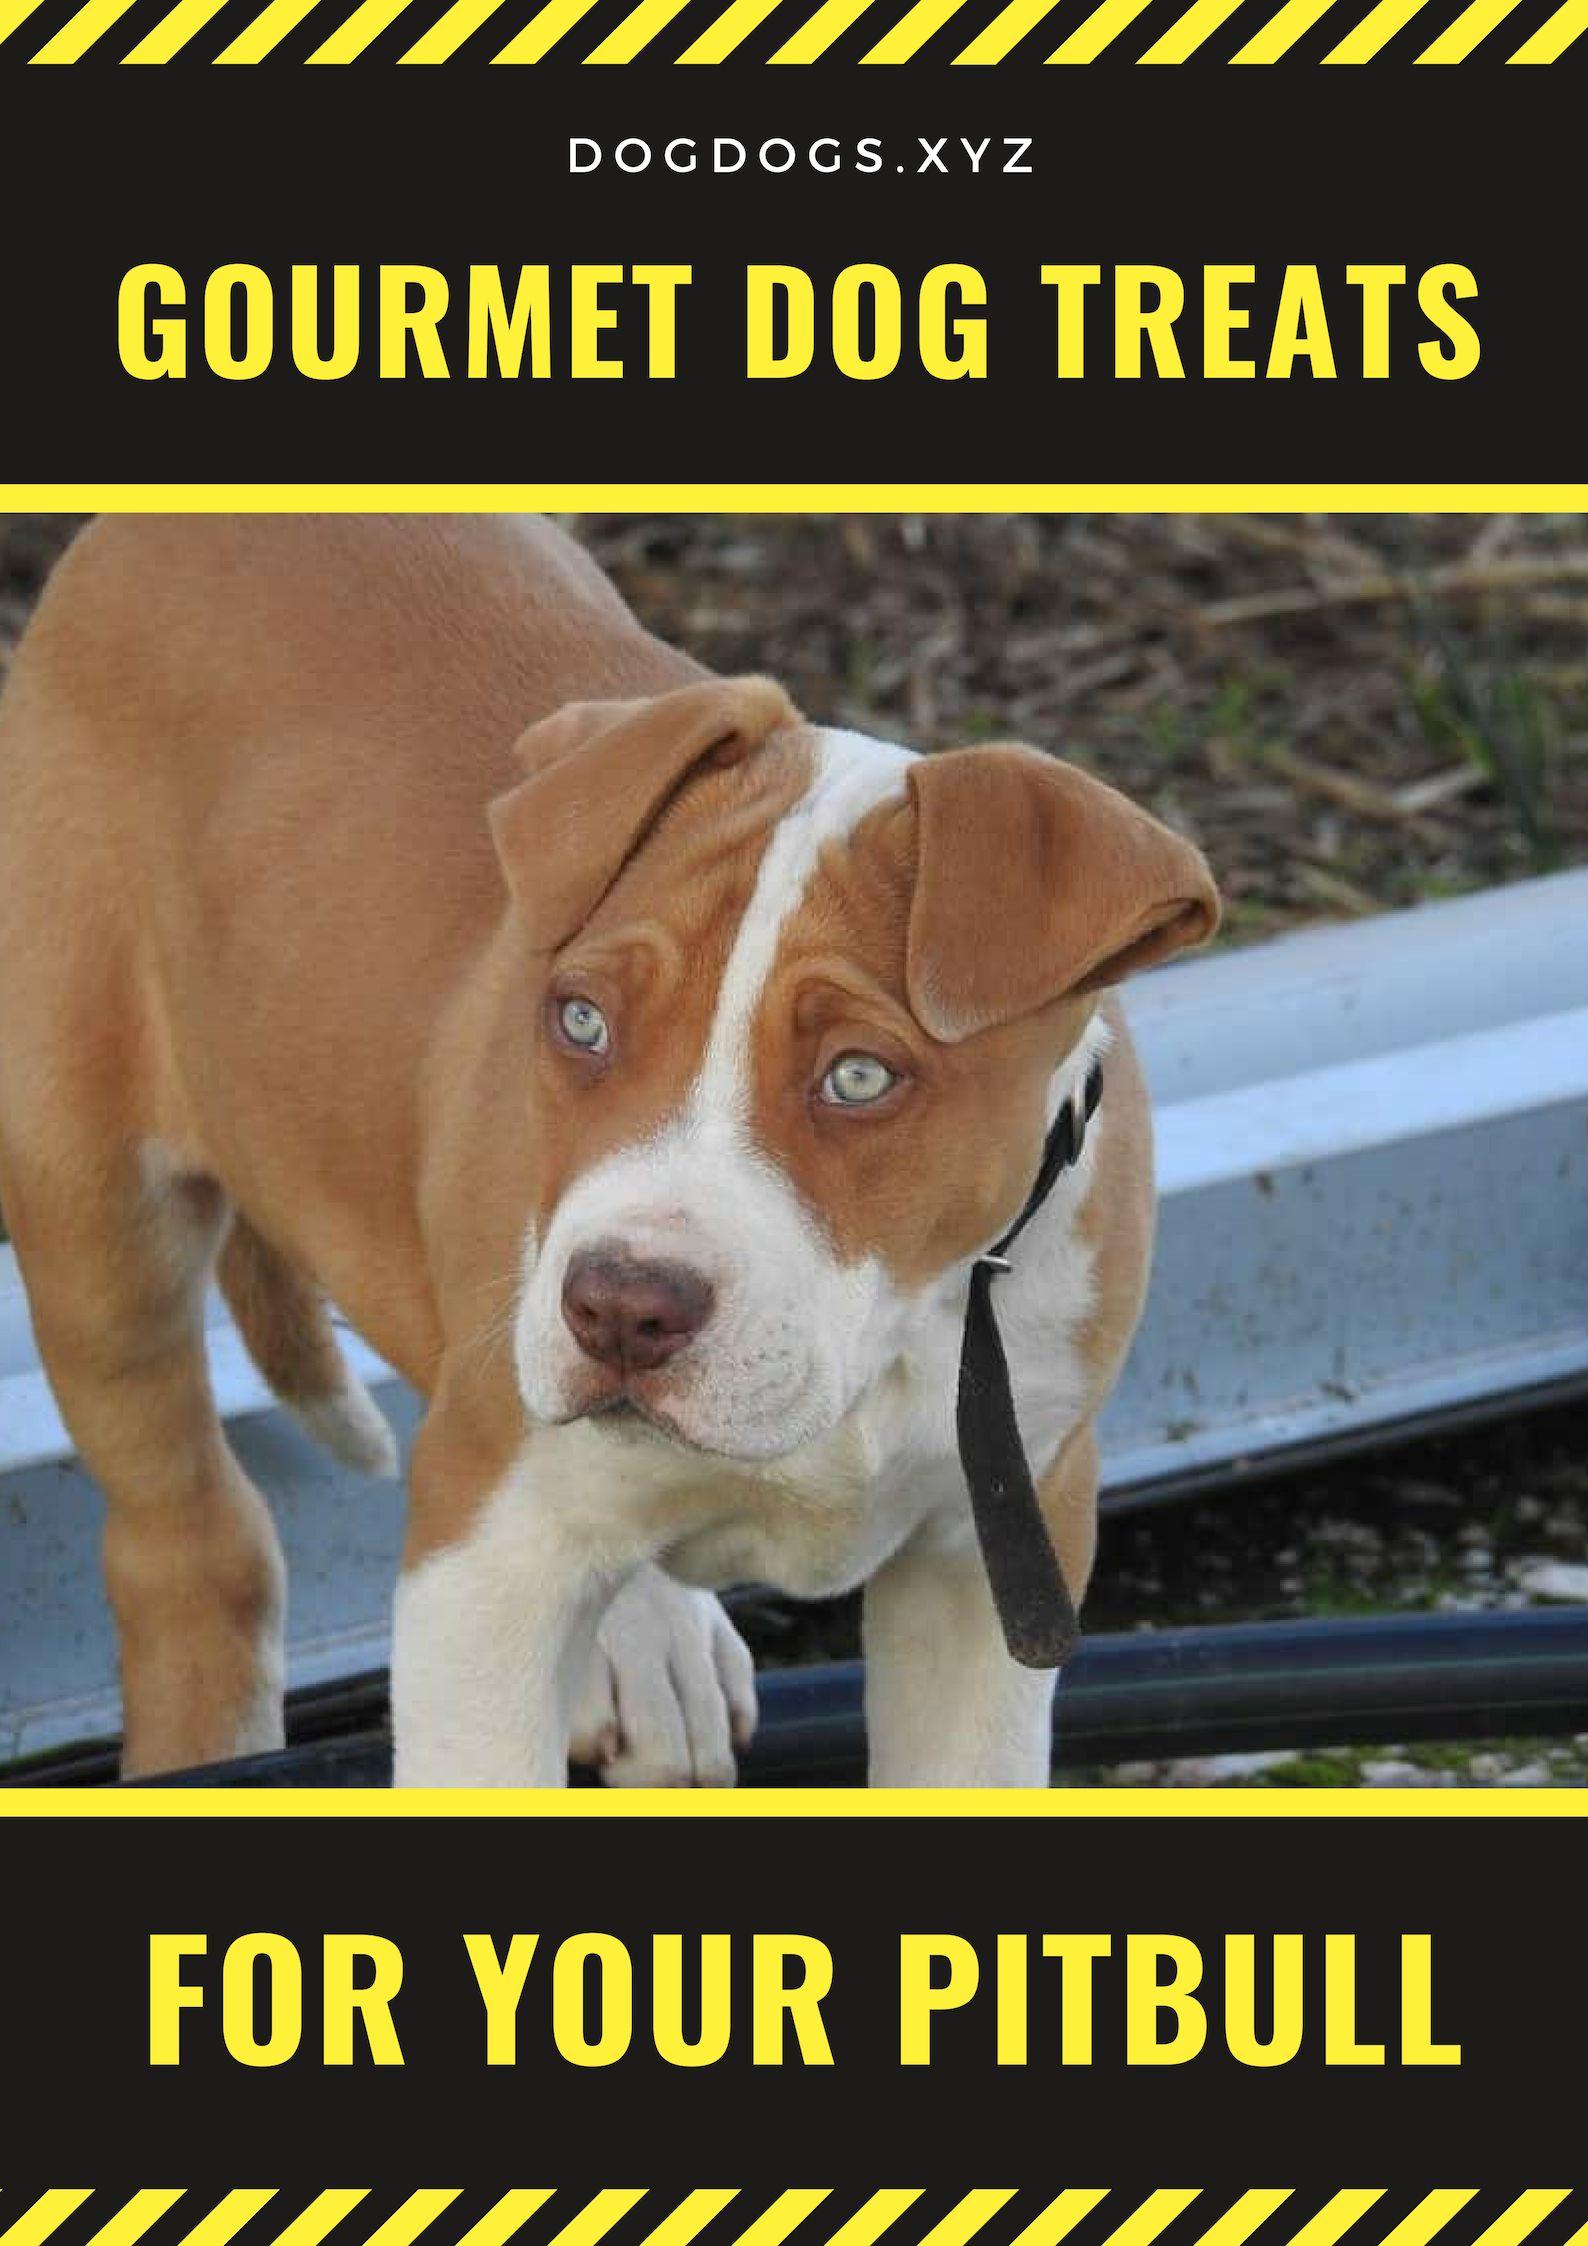 Gourmet Dog Treats For Your Pitbull My Lover Gourmet Dog